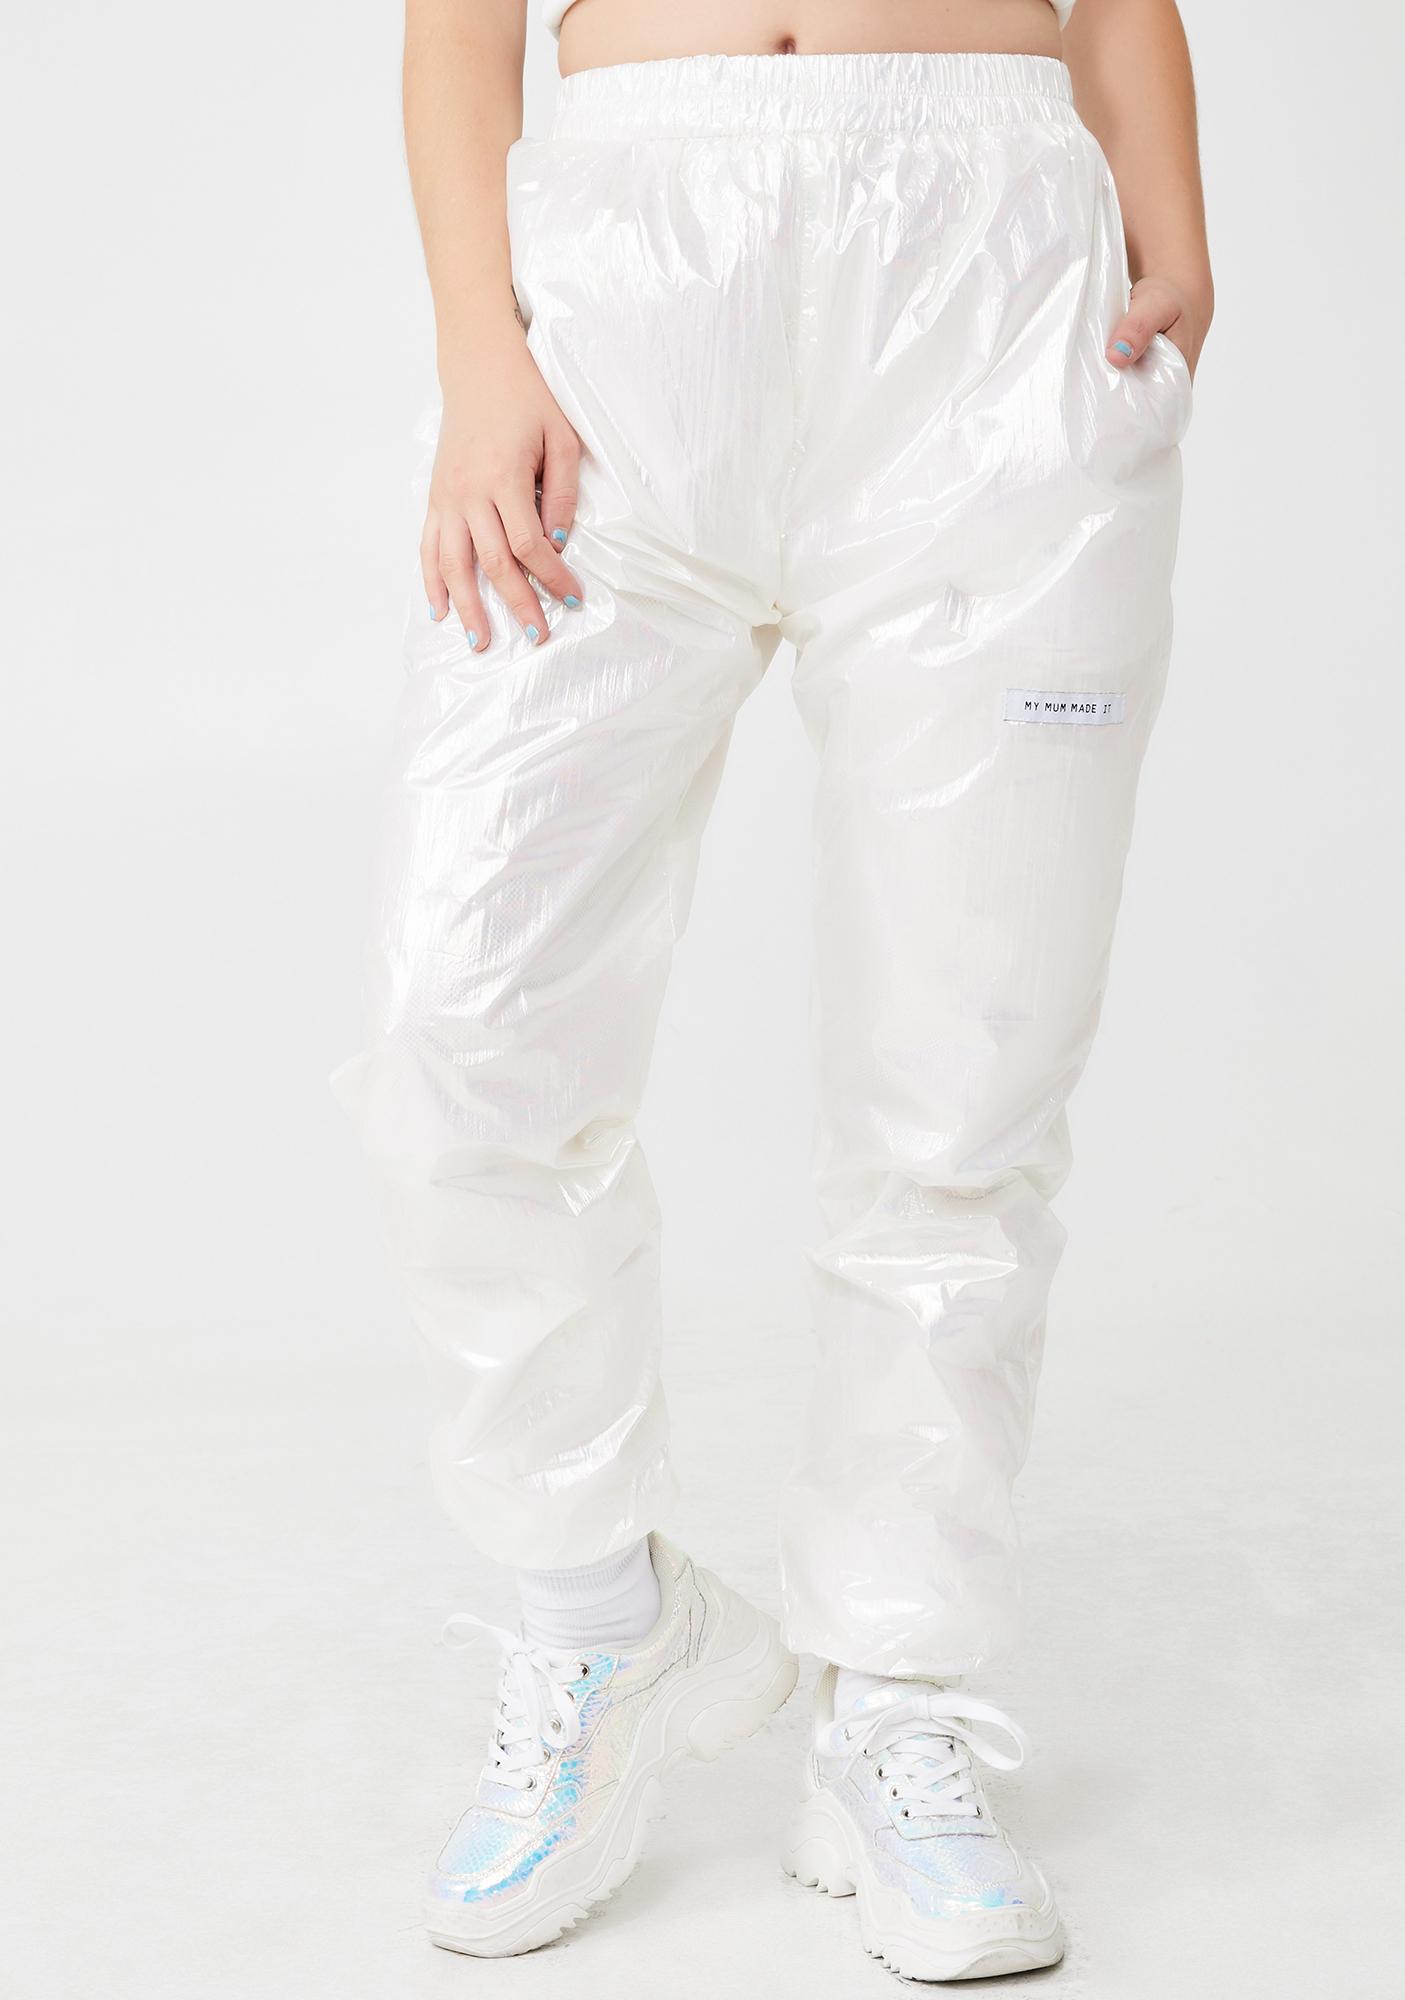 My Mum Made It Icy Metallic Sweatpants